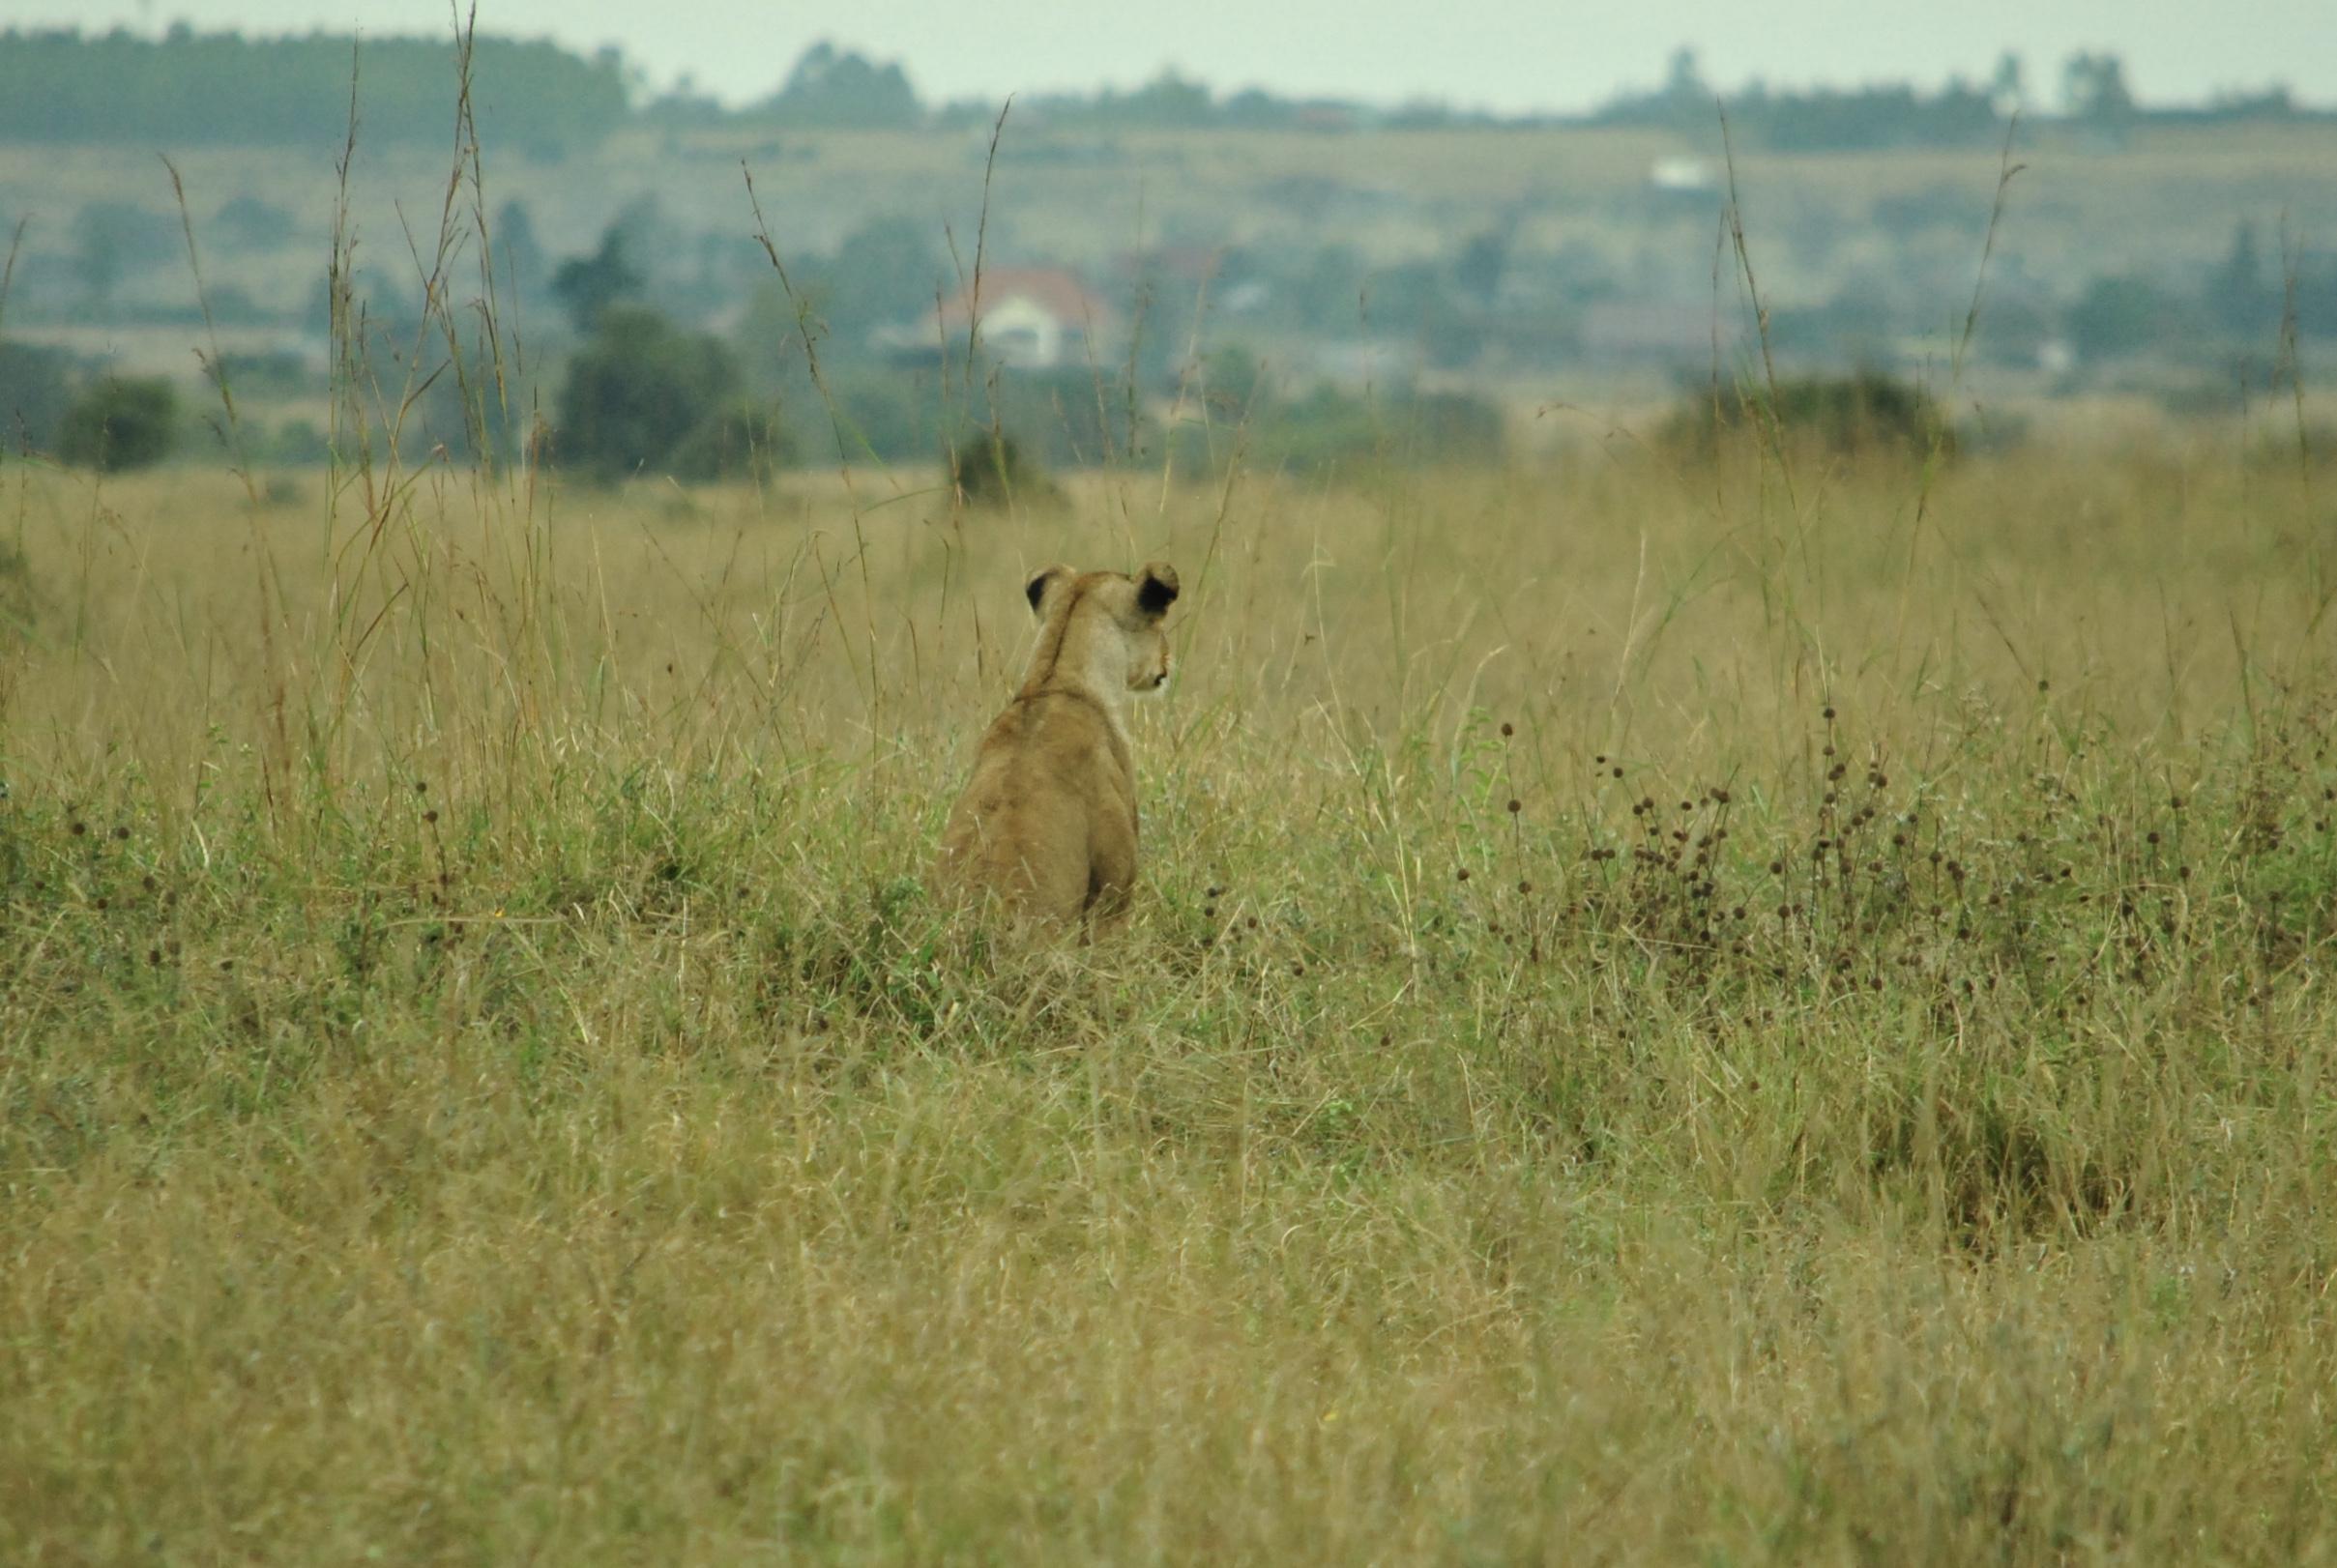 A single source of truth - Can the Huduma Namba succeed as